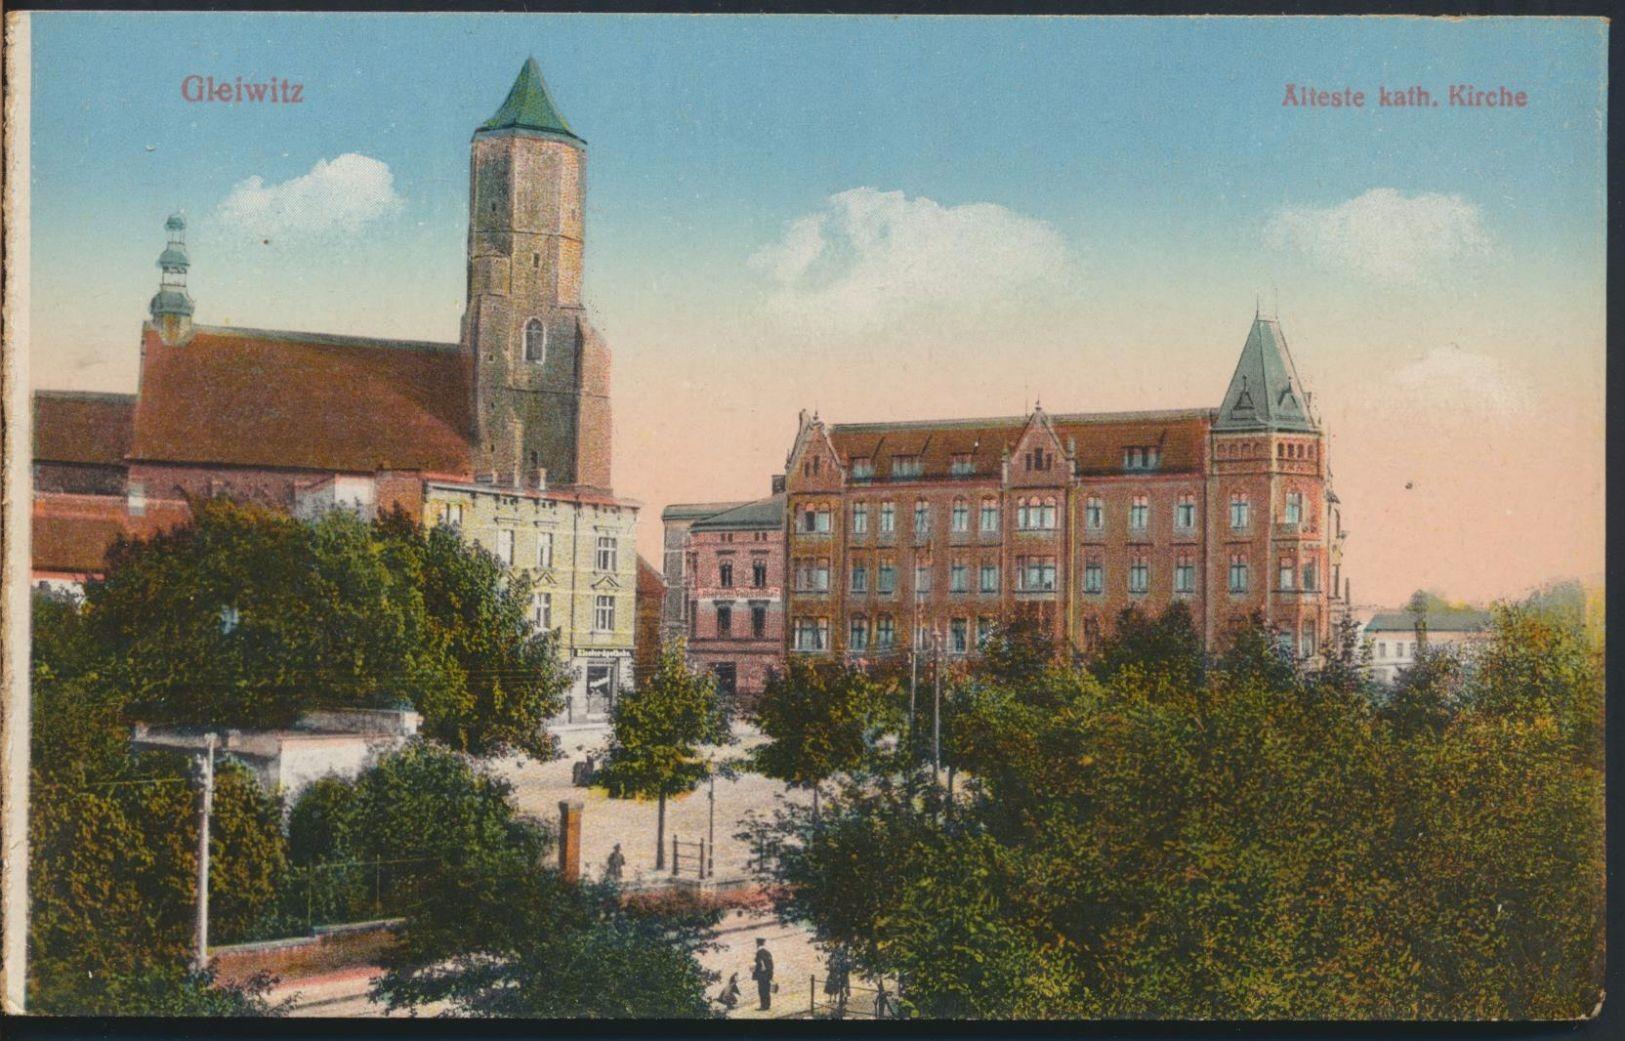 °°° 5042 - GERMANY - GLEIWITZ - ALTESTE KATH. KIRCHE °°° - Schlesien